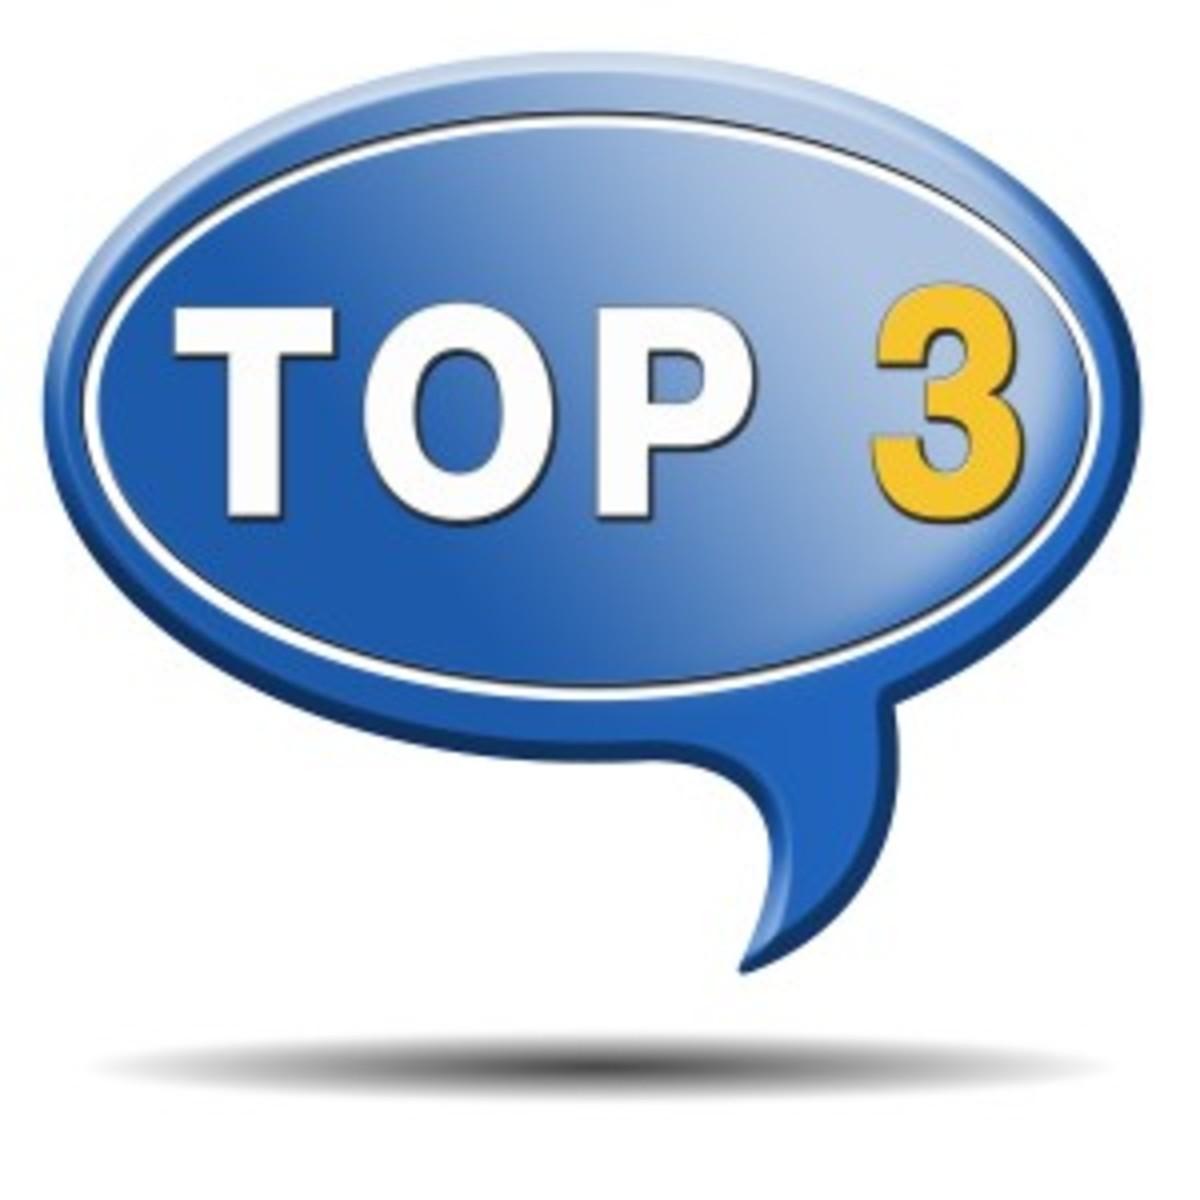 top 3 charts list pop poll result and award winners chart rankin